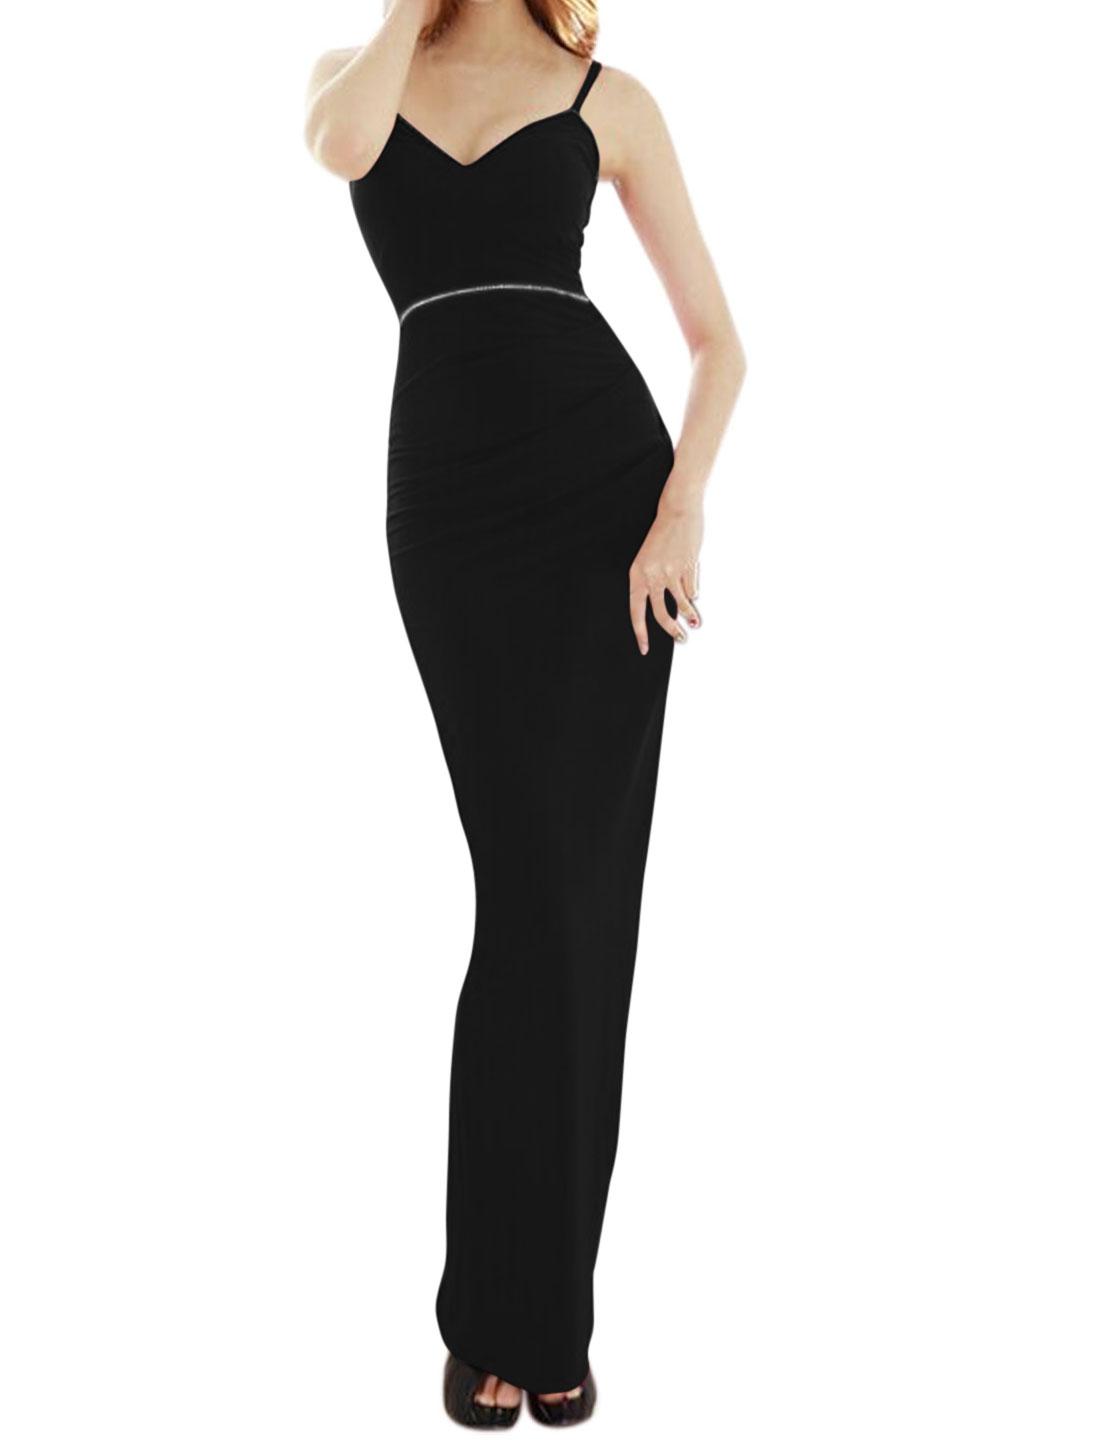 Lady Sweetheart Neckline Spaghetti Straps High Split Maxi Dress Black XS